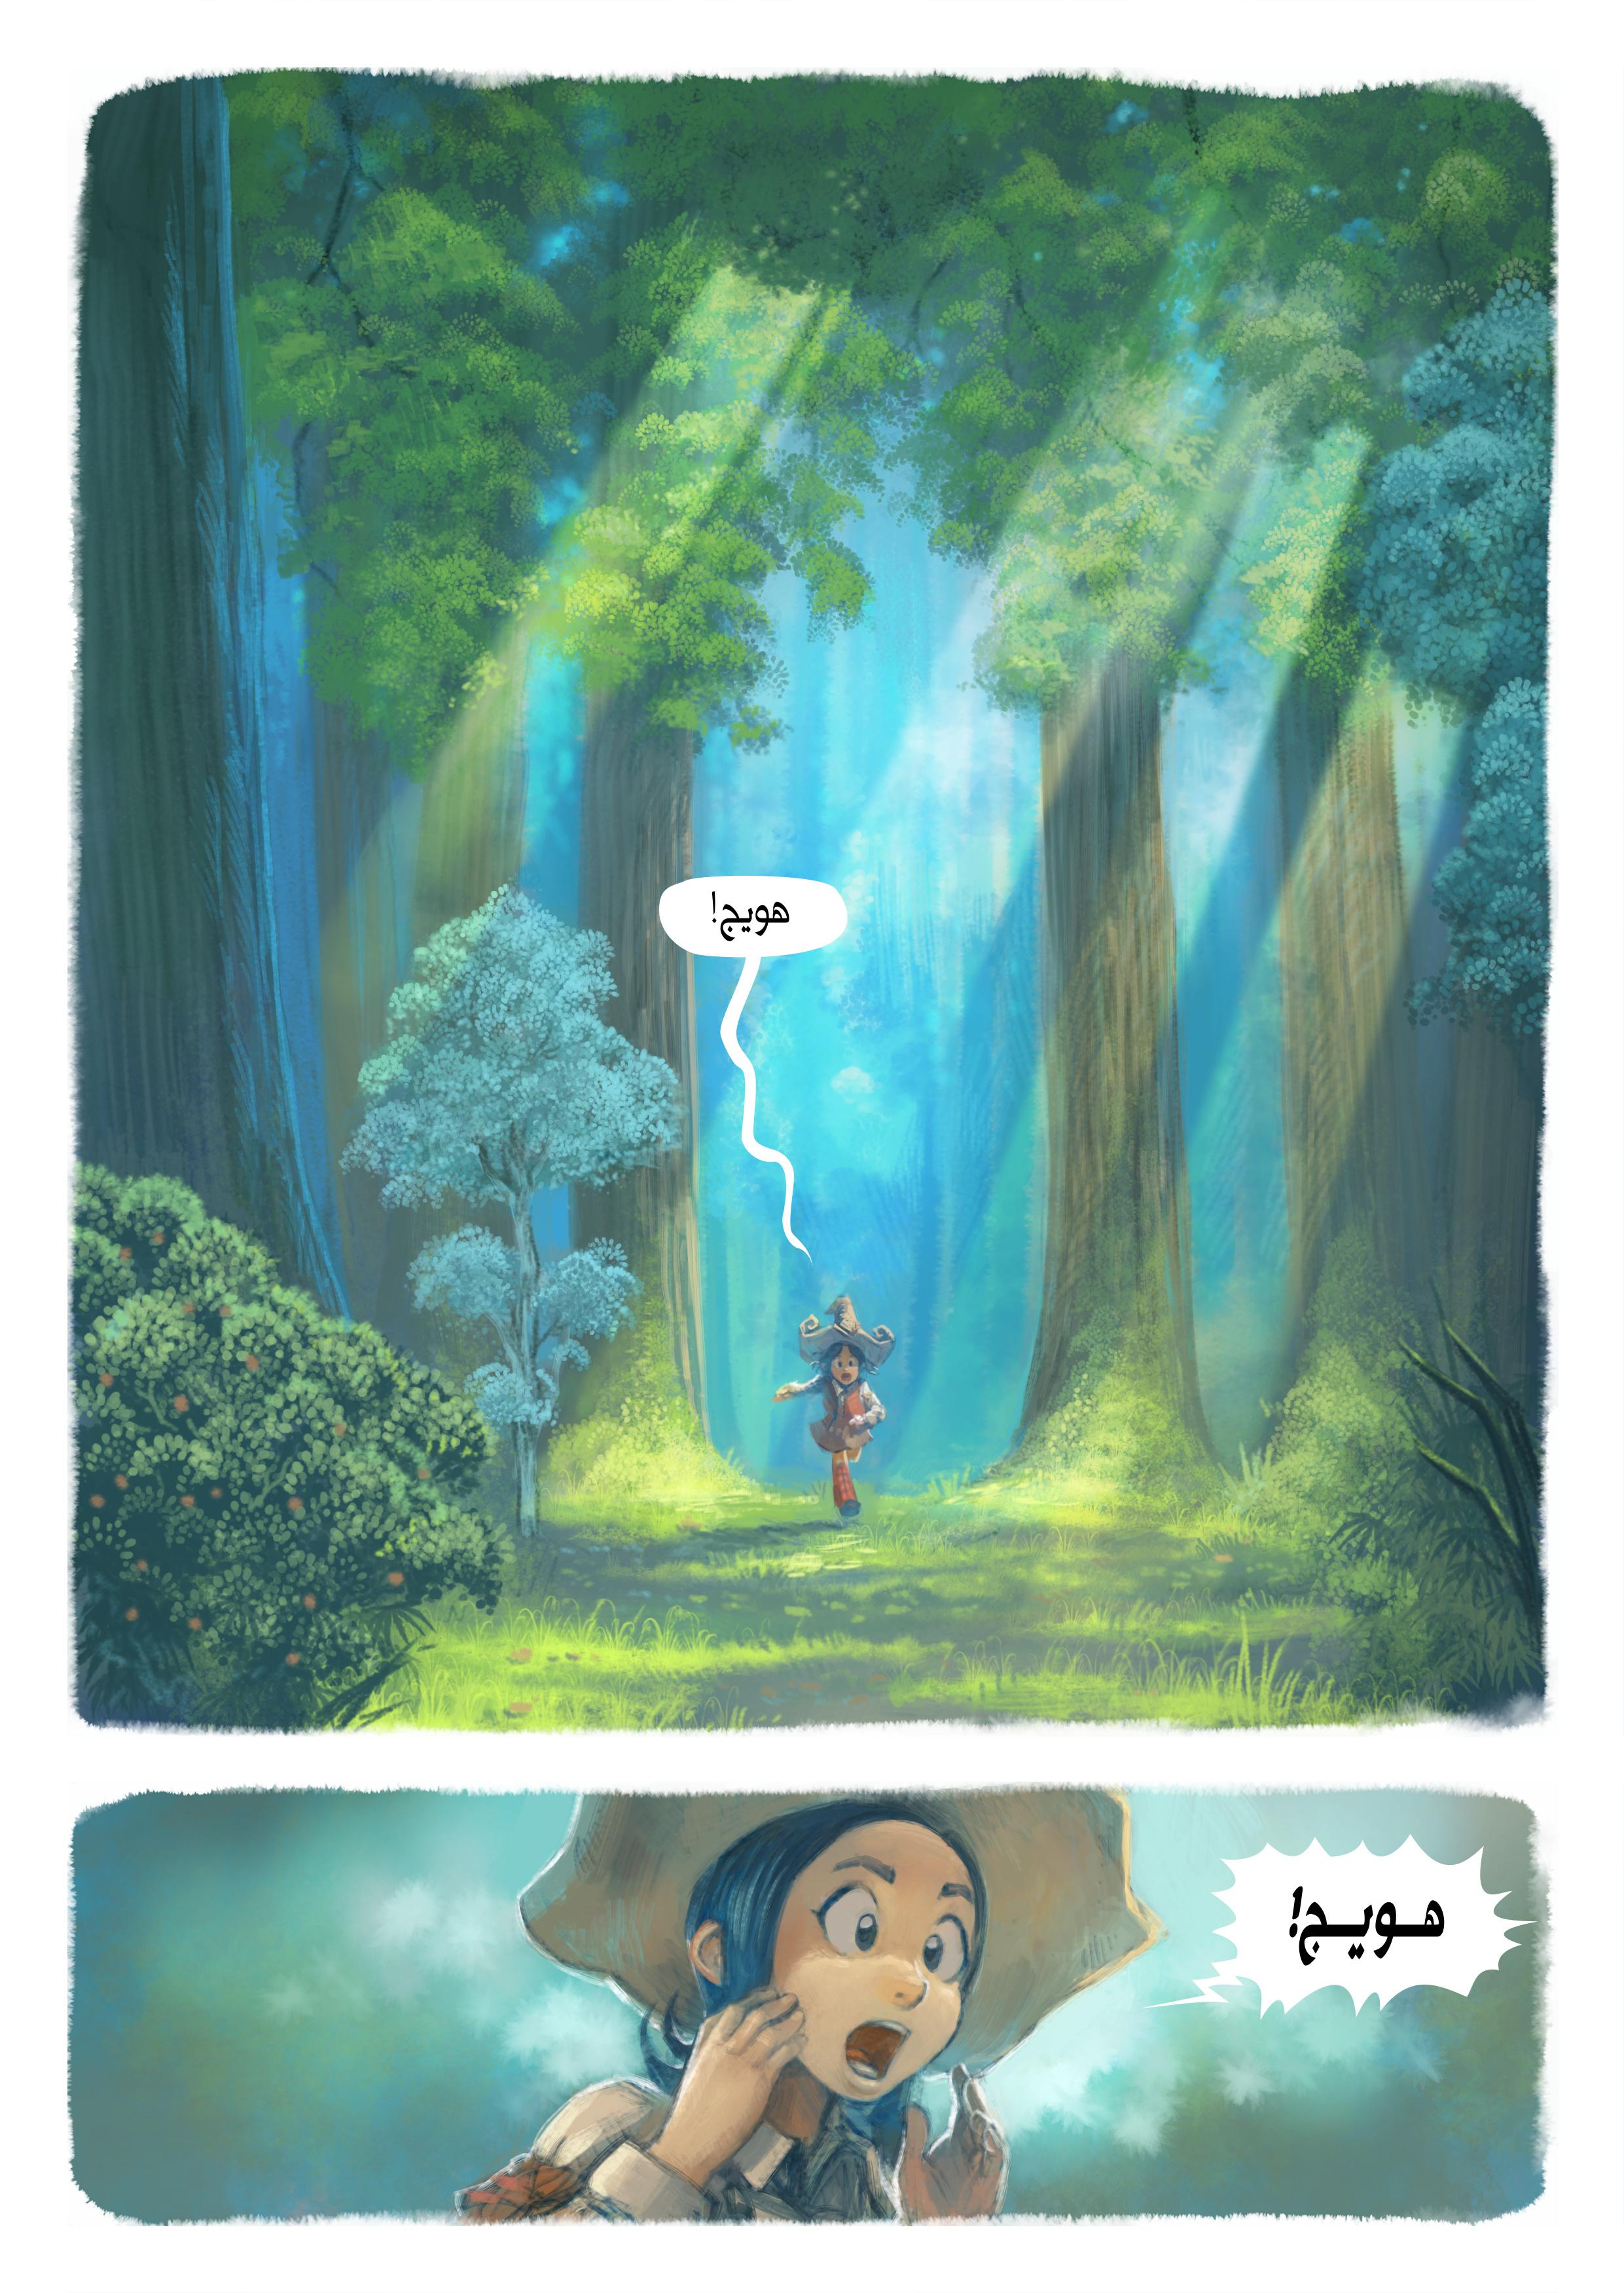 قسمت هفتم: آرزو, Page 1